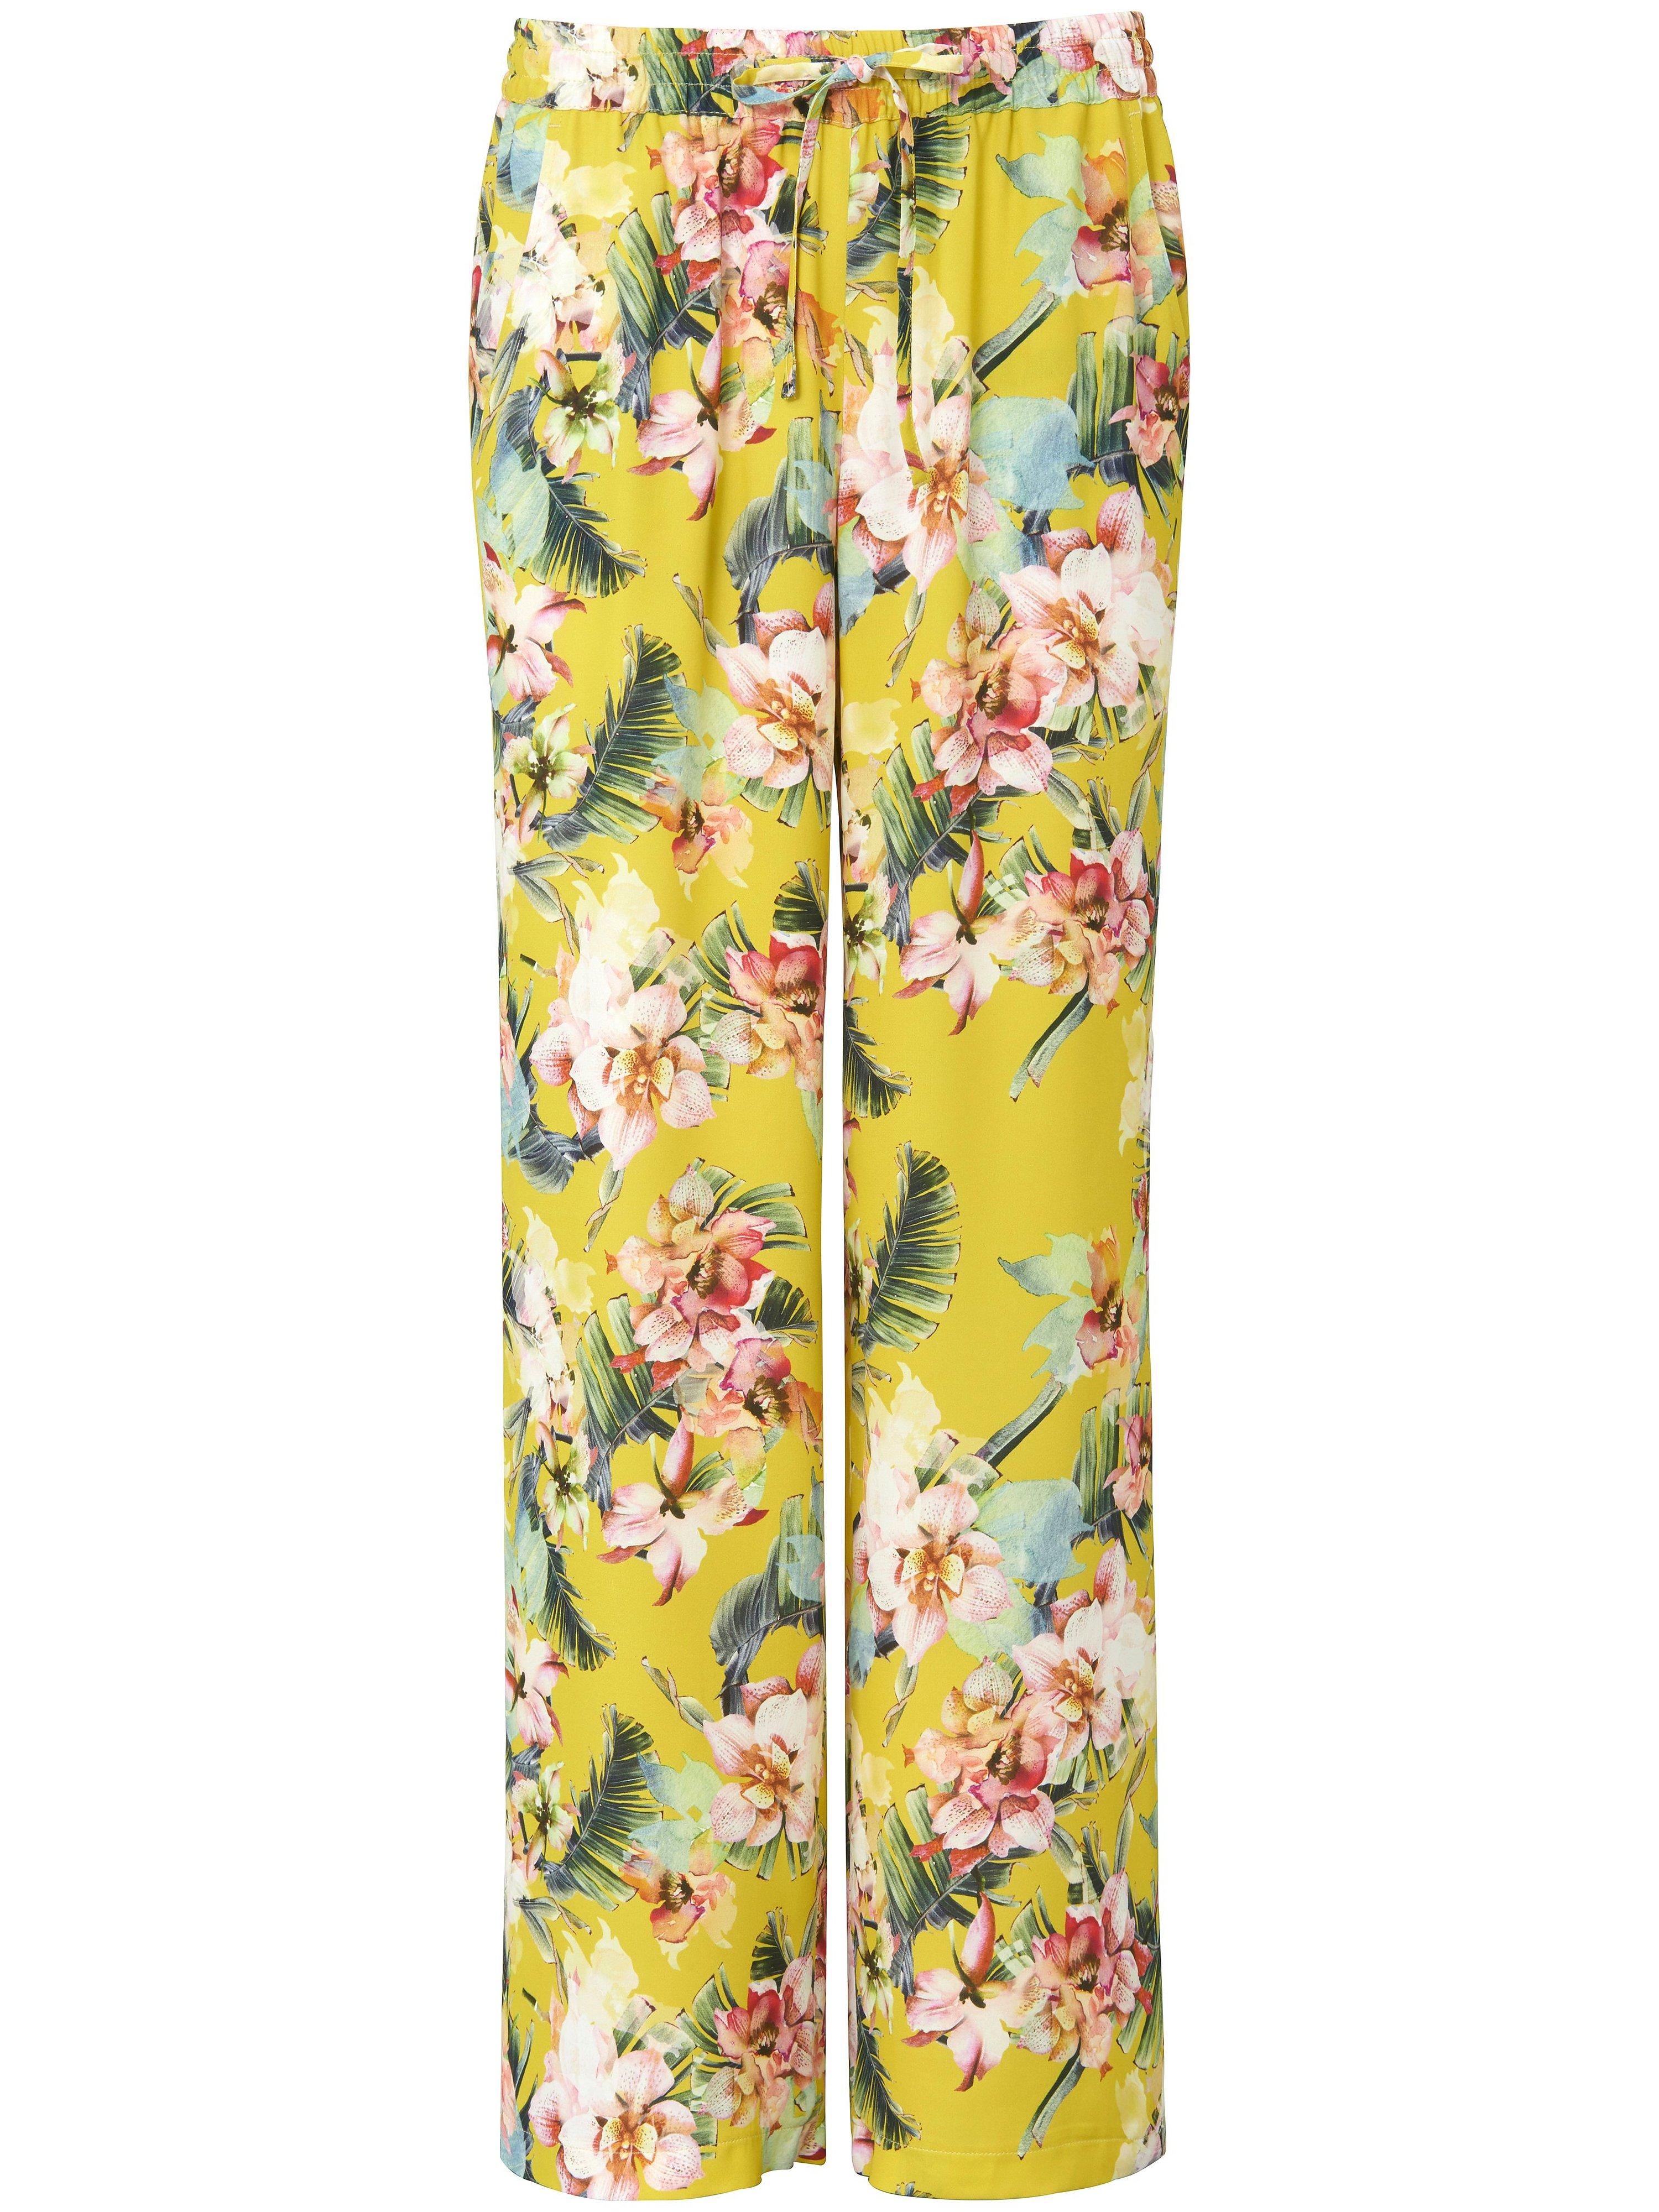 Trousers, Cornelia fit Peter Hahn yellow